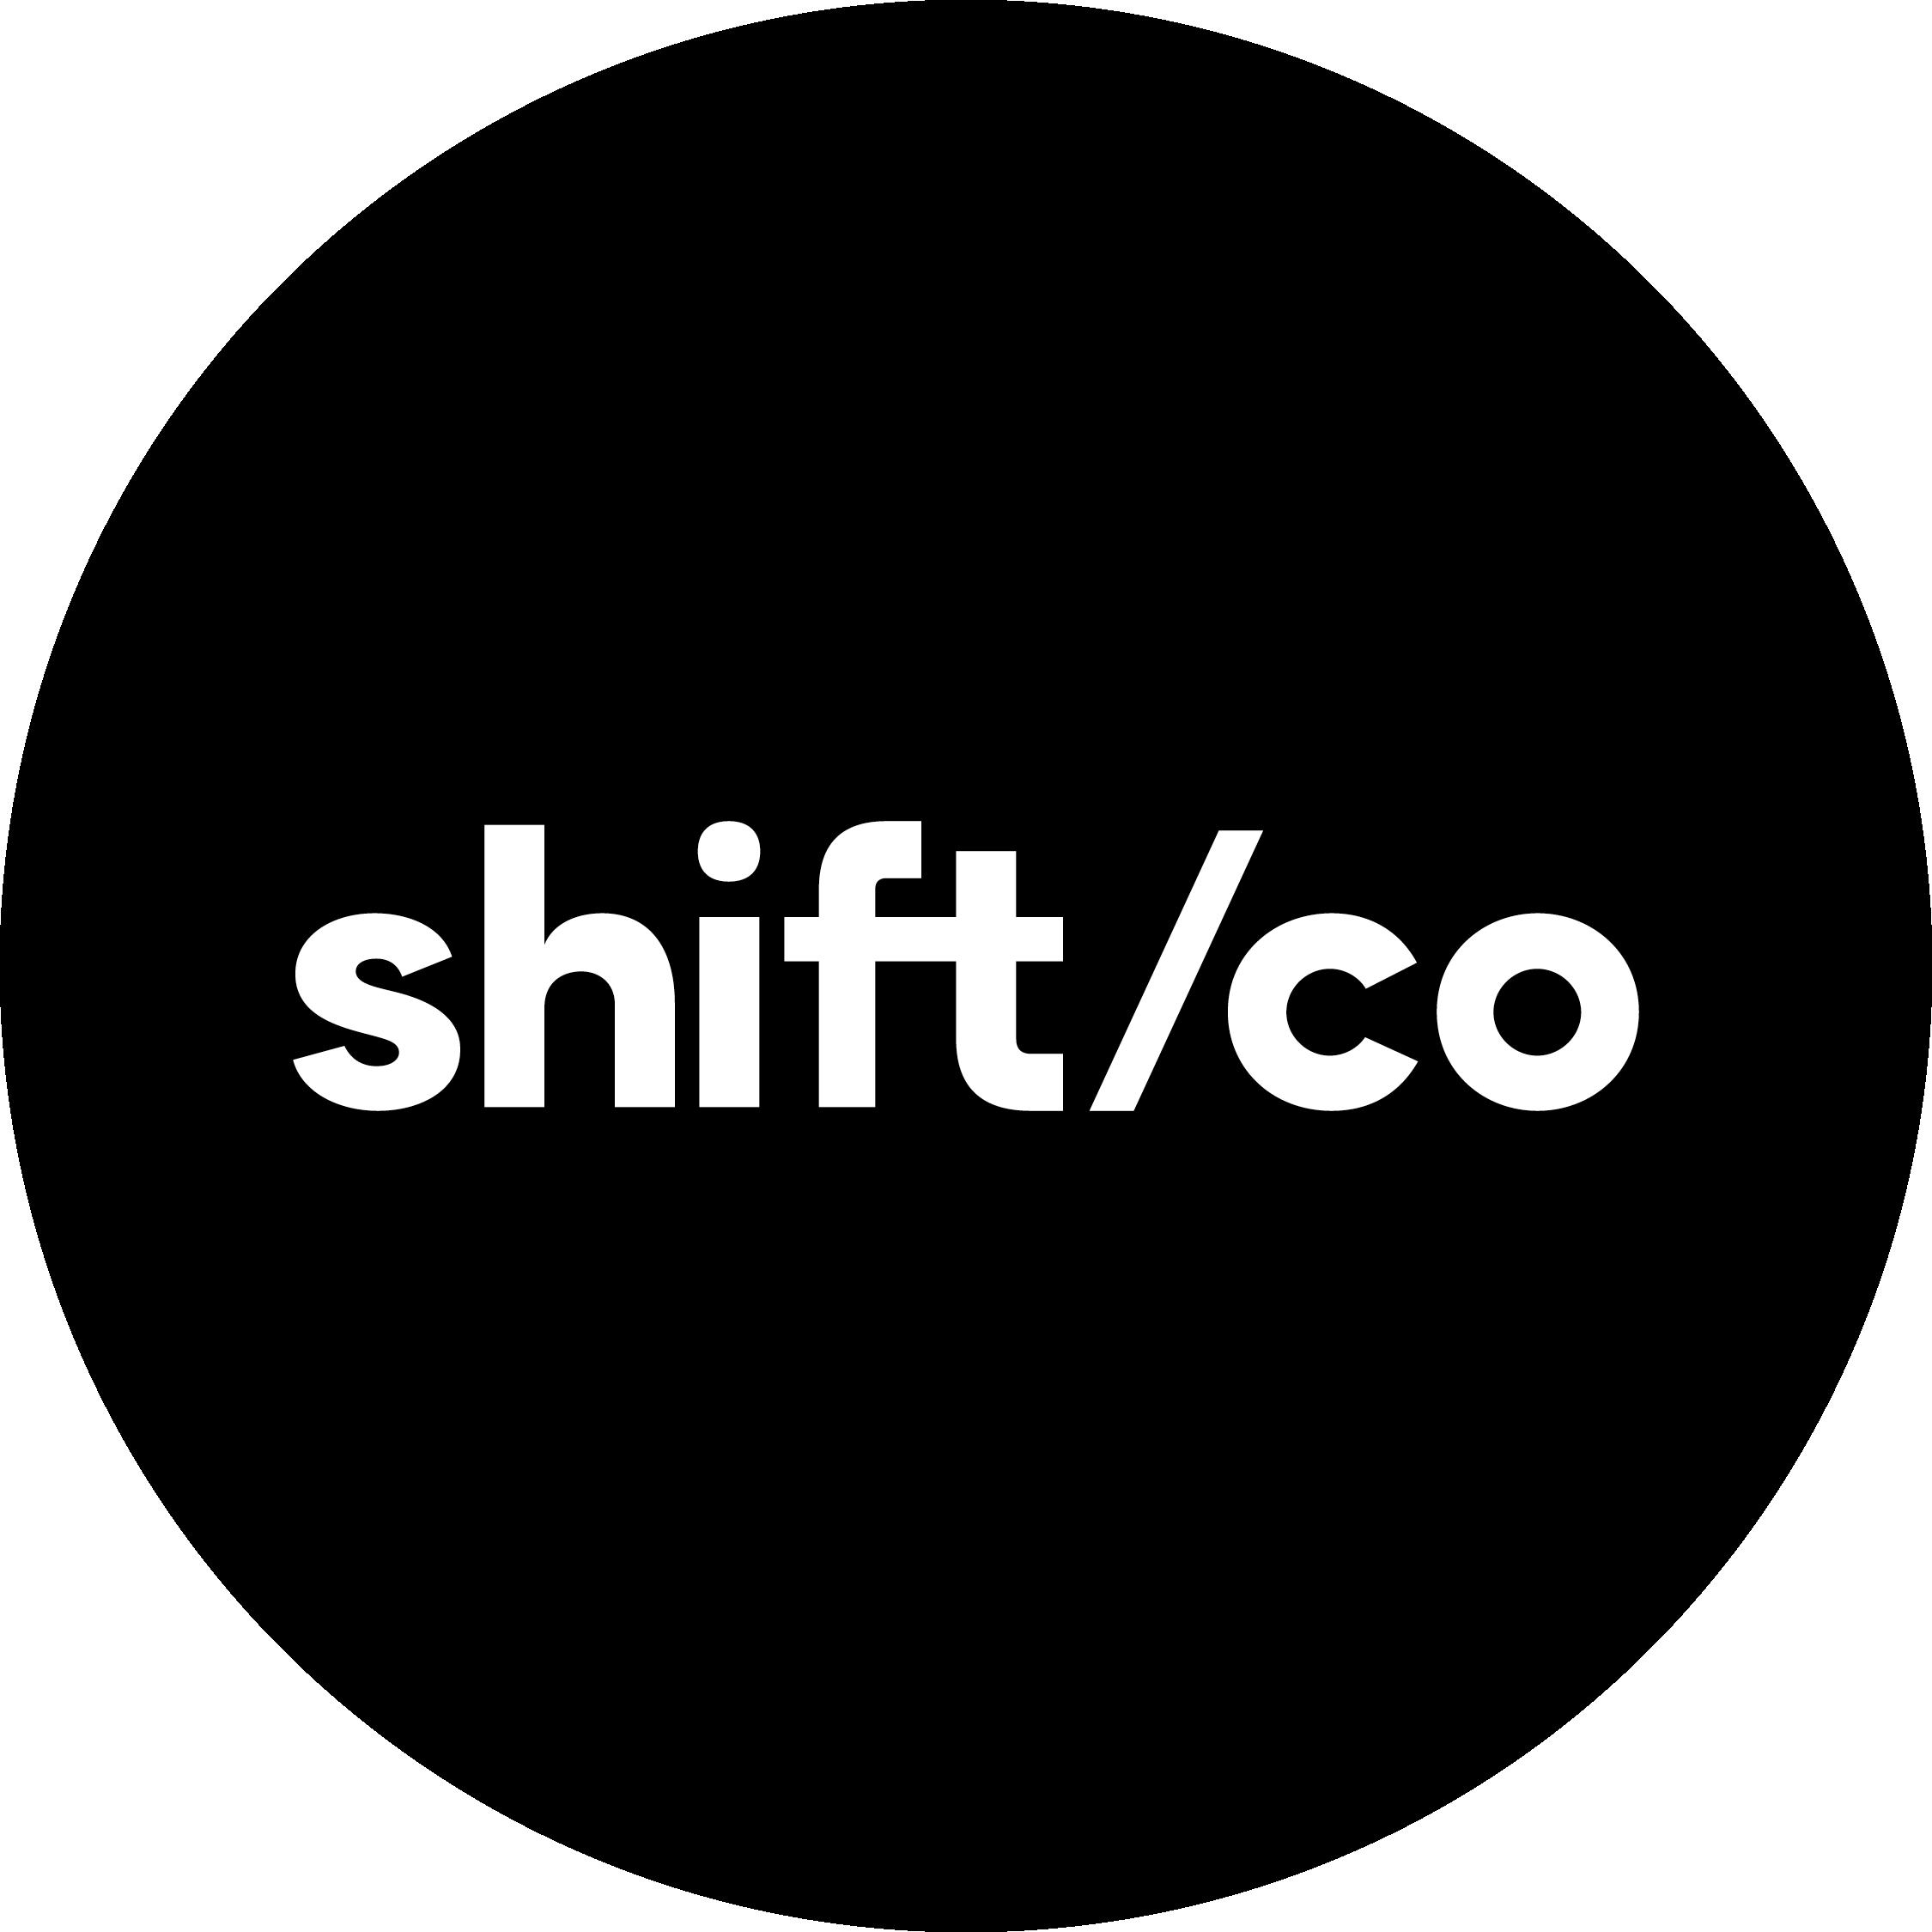 shift/co circle